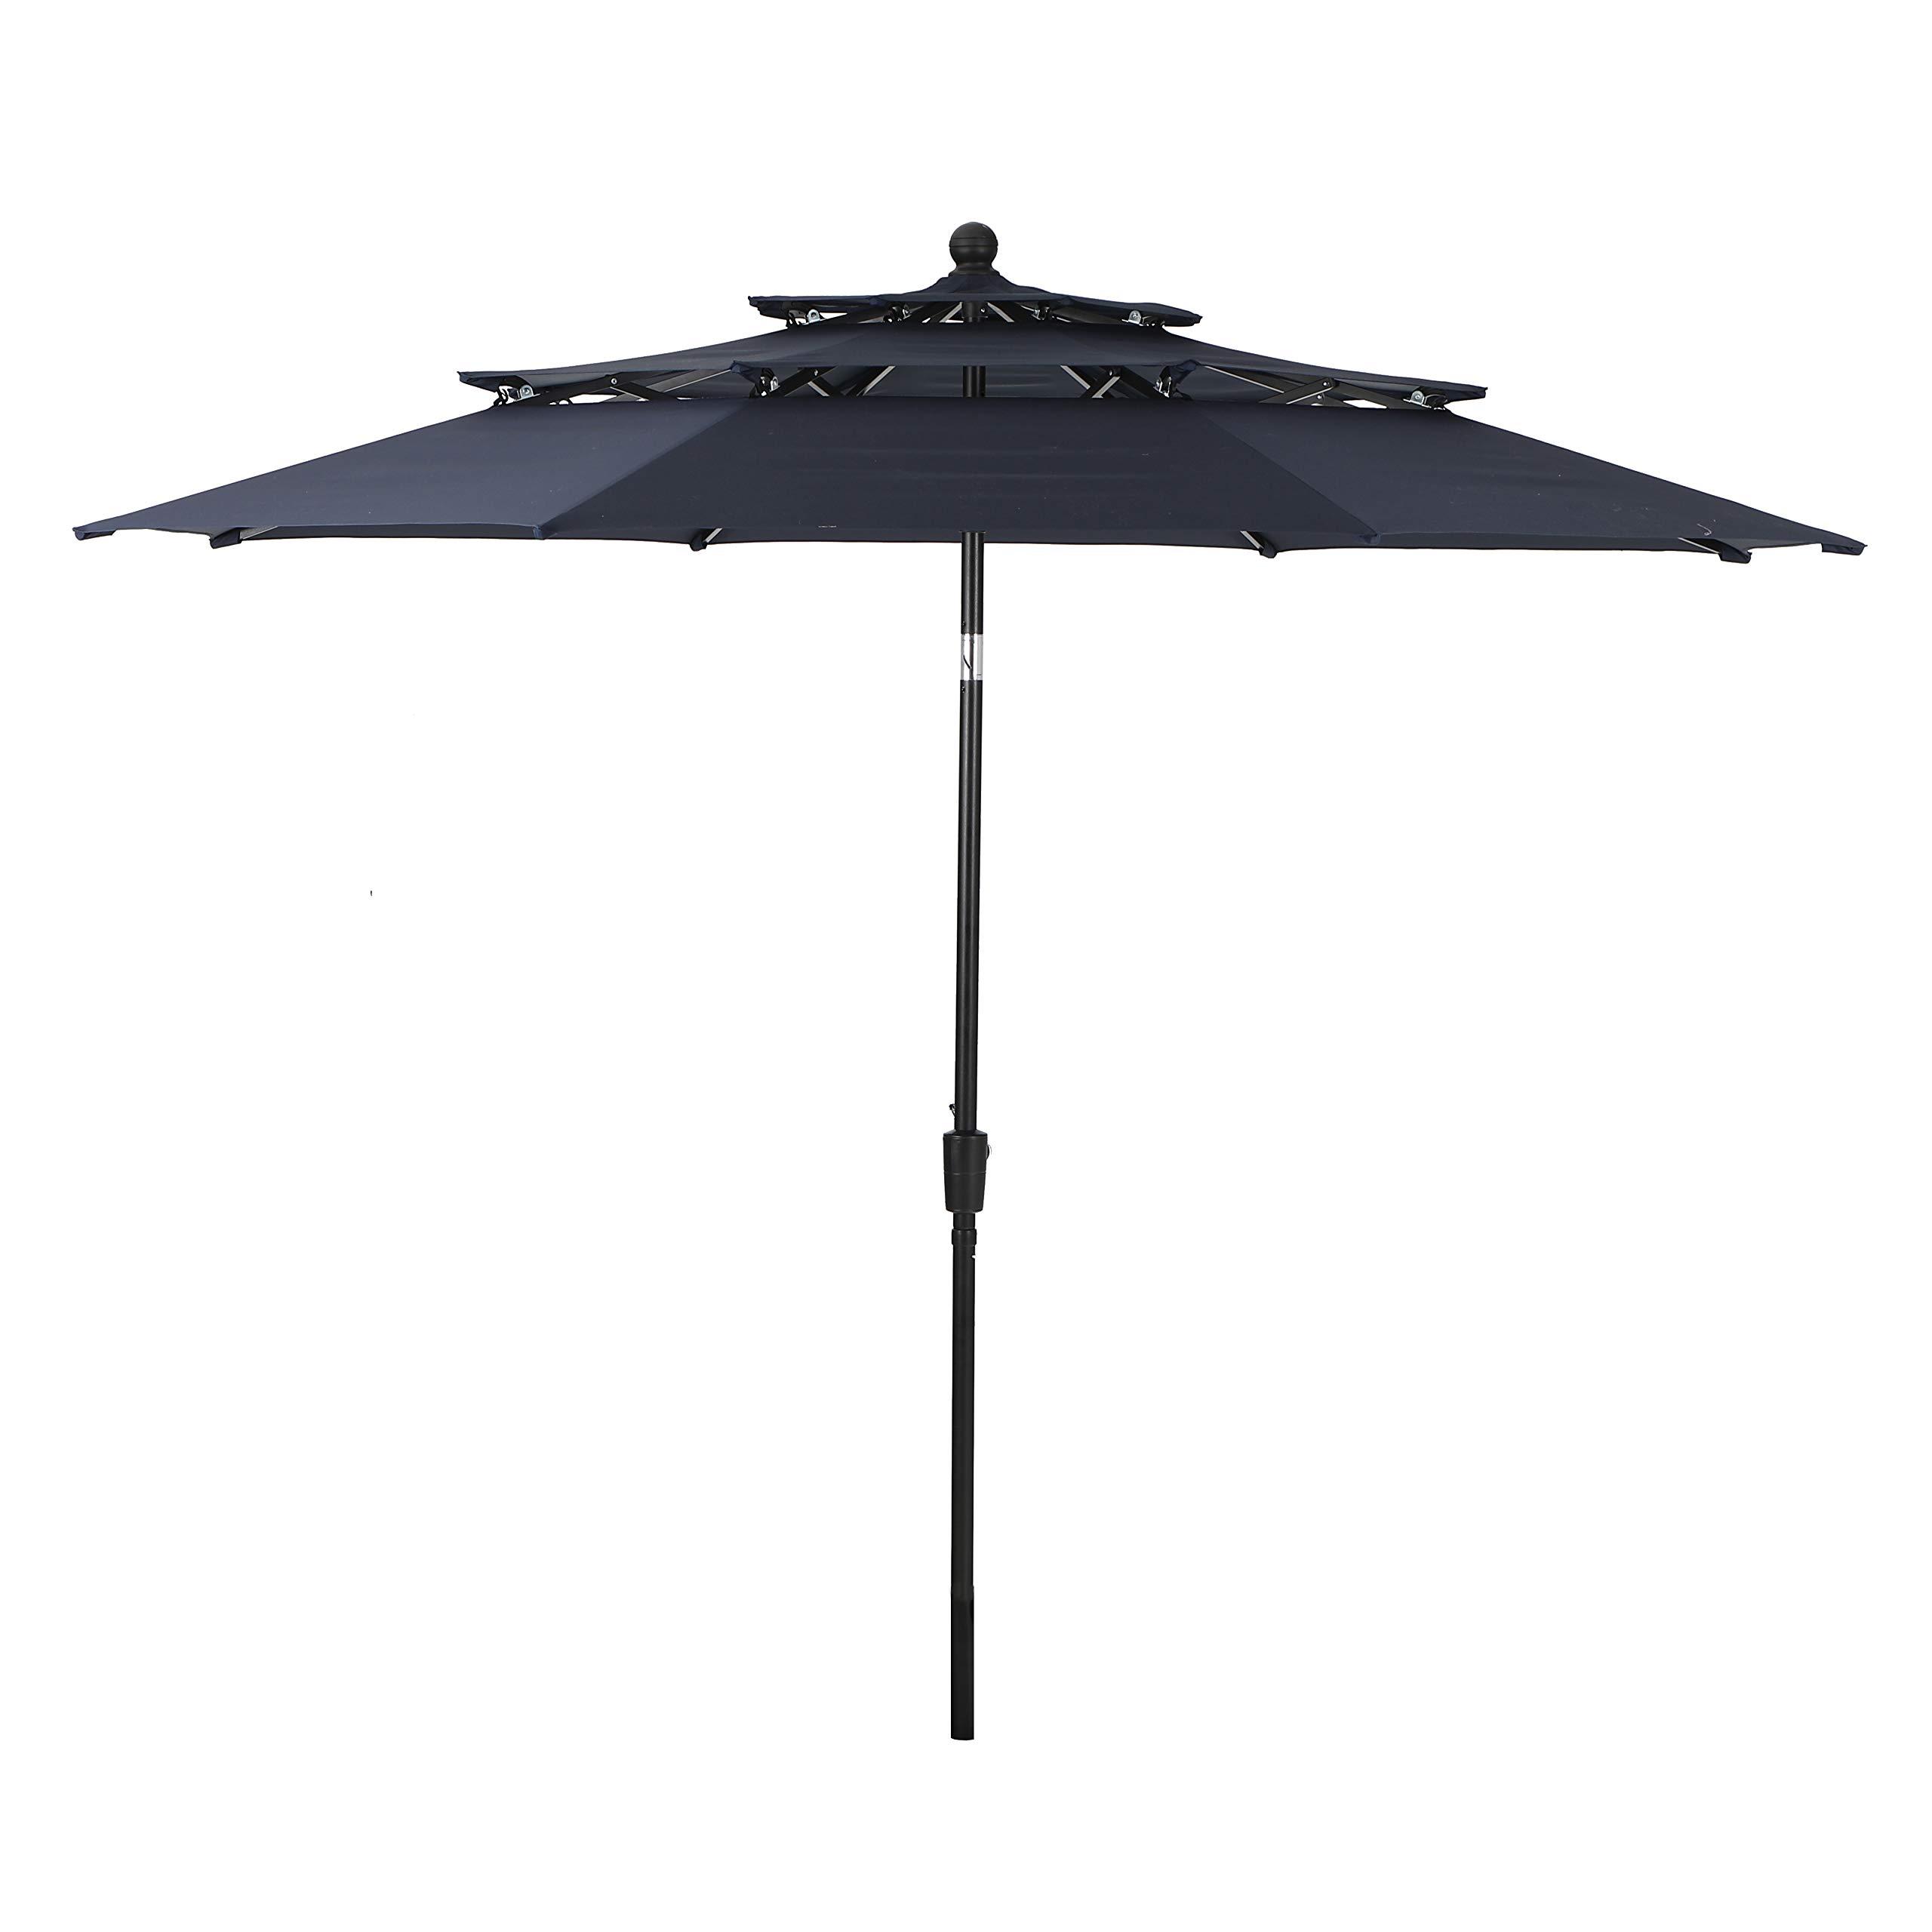 PHI VILLA 10ft 3 Tier Auto-tilt Patio Umbrella Outdoor Double Vented Umbrella, Navy